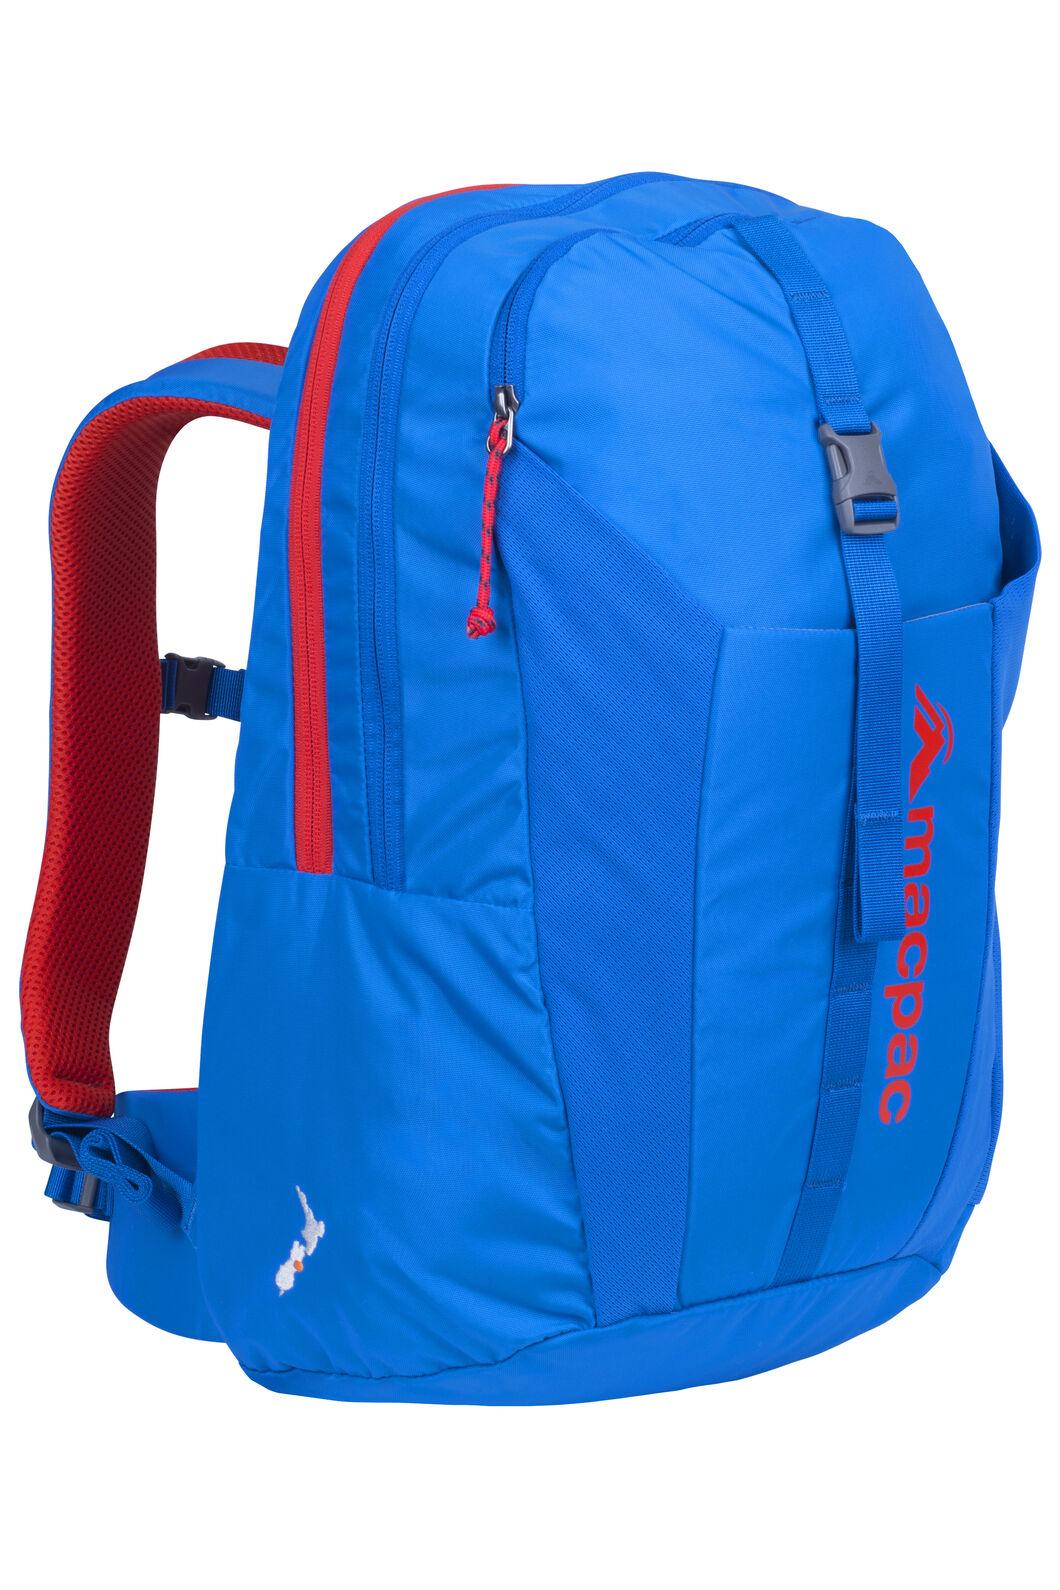 Macpac Summit Ridge 22L Daypack - Kids', Victoria Blue, hi-res